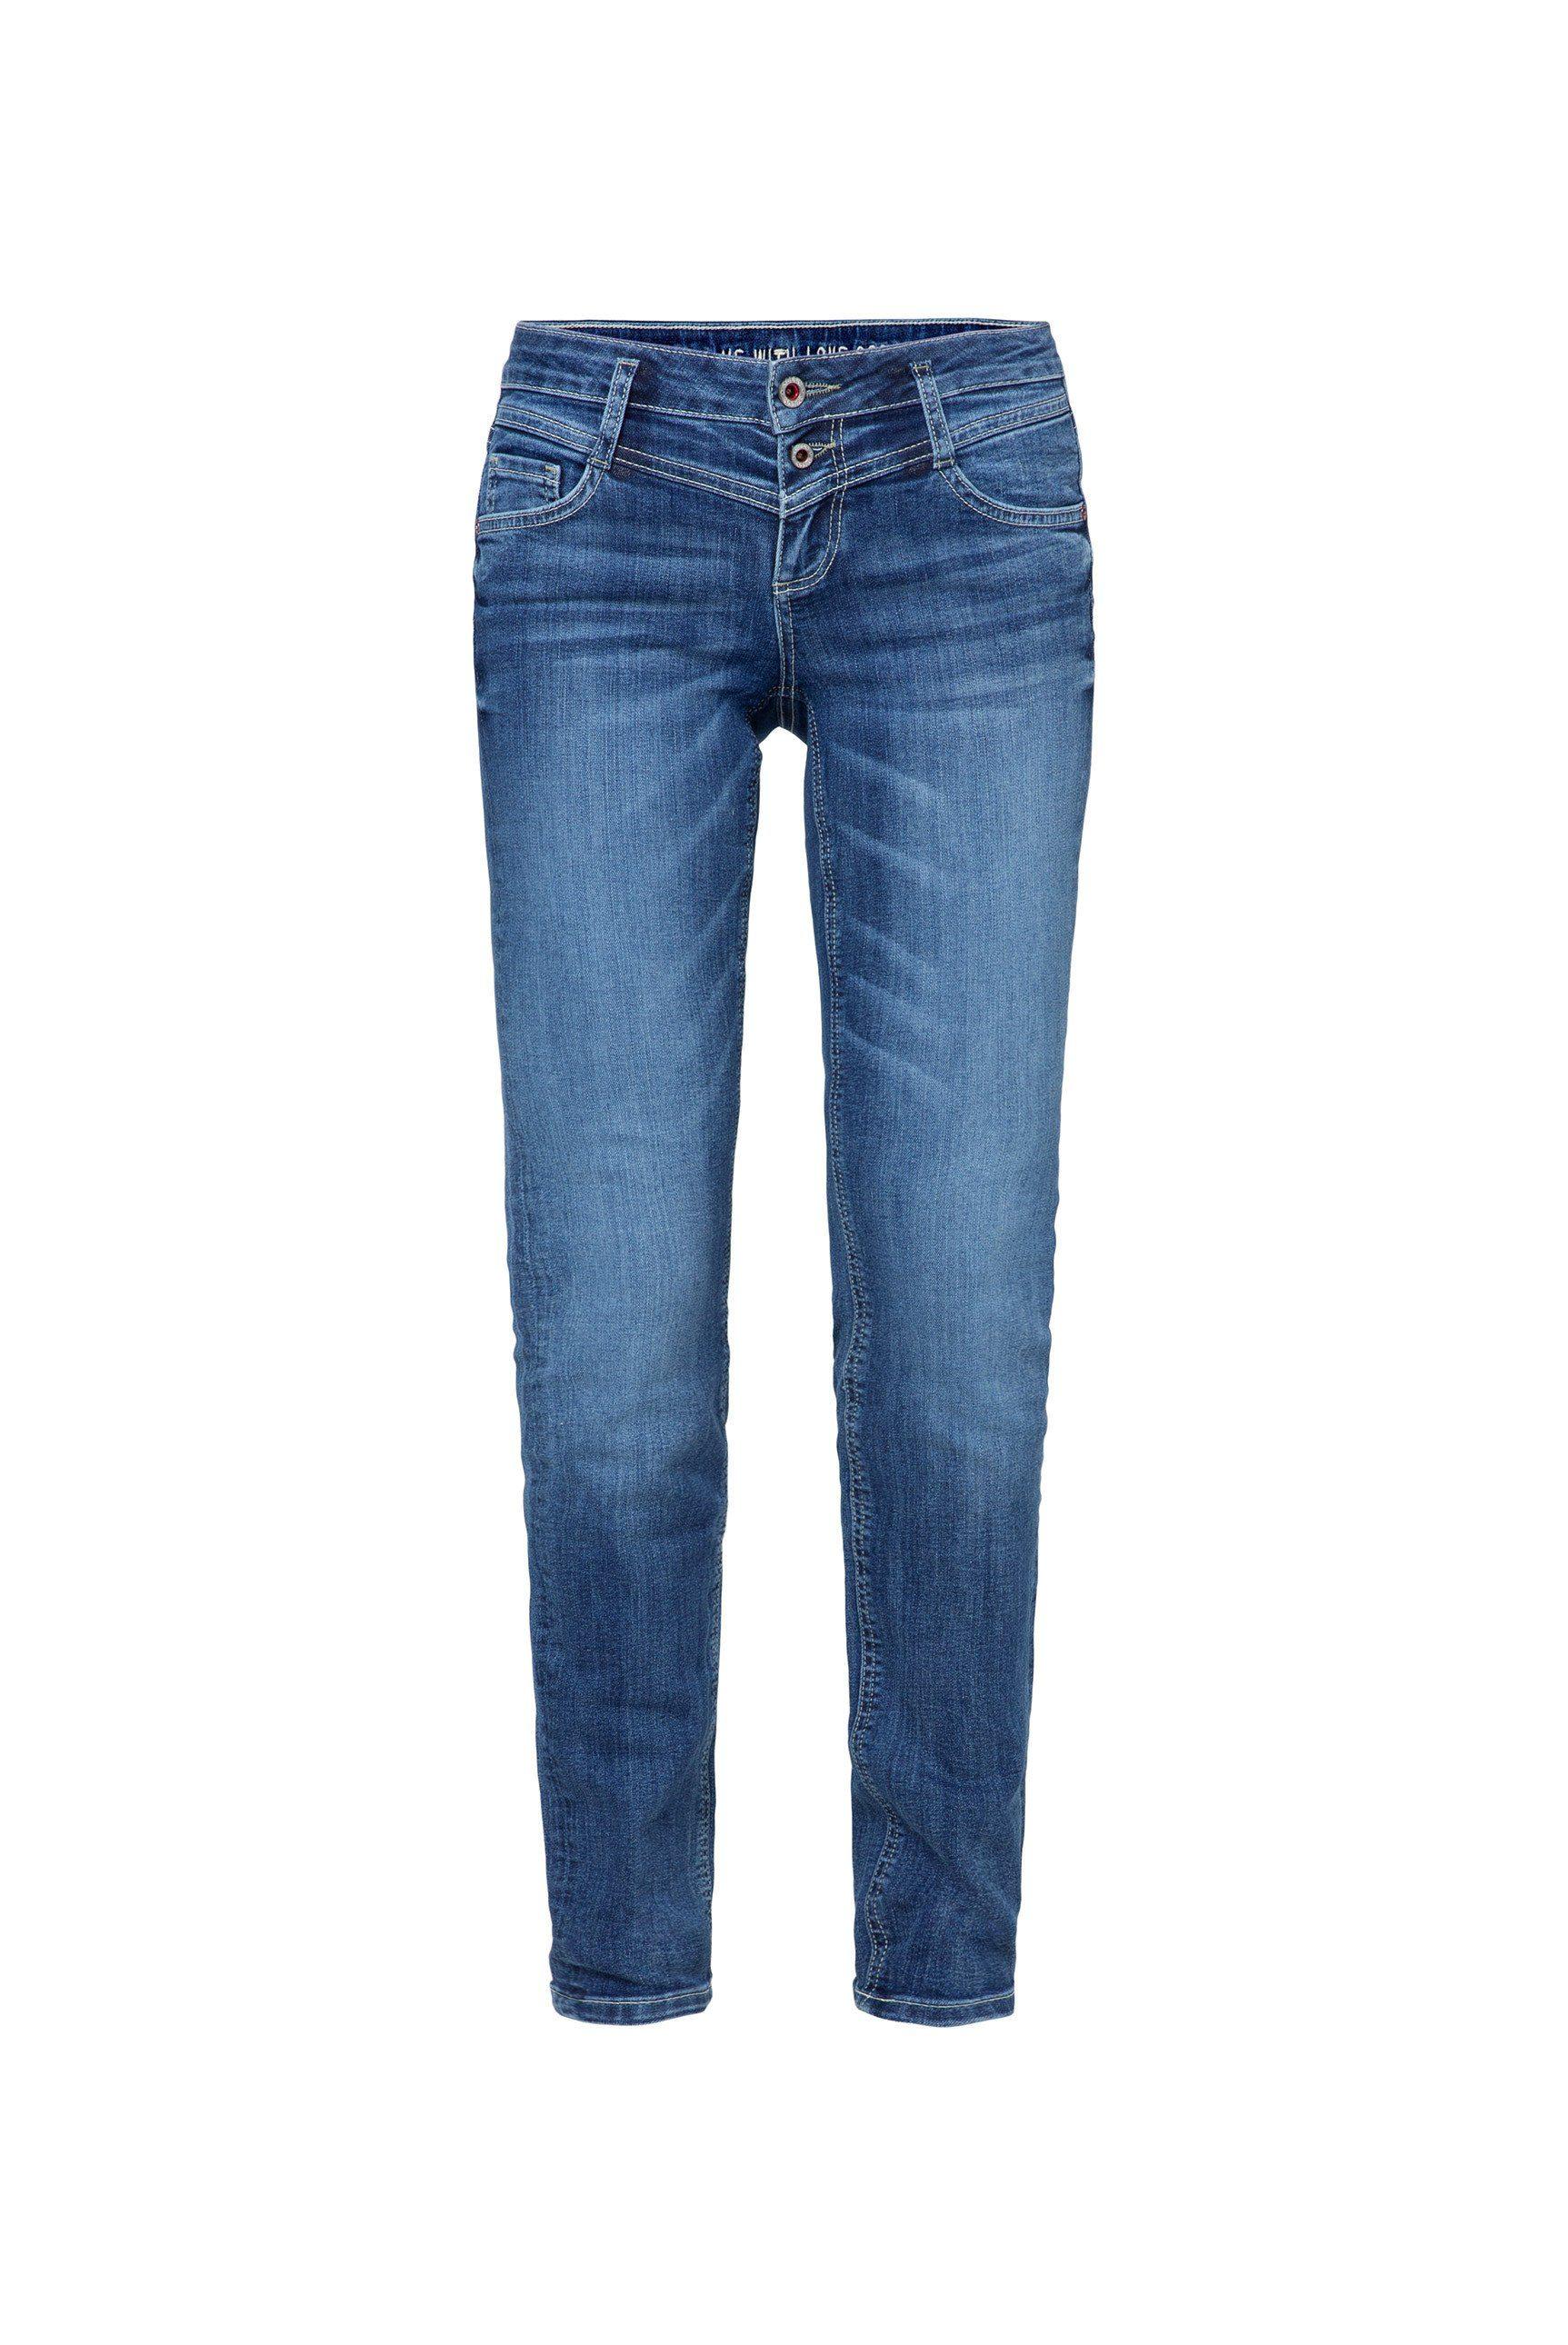 SOCCX Slim-fit-Jeans KA:RA mit Stretch-Anteil